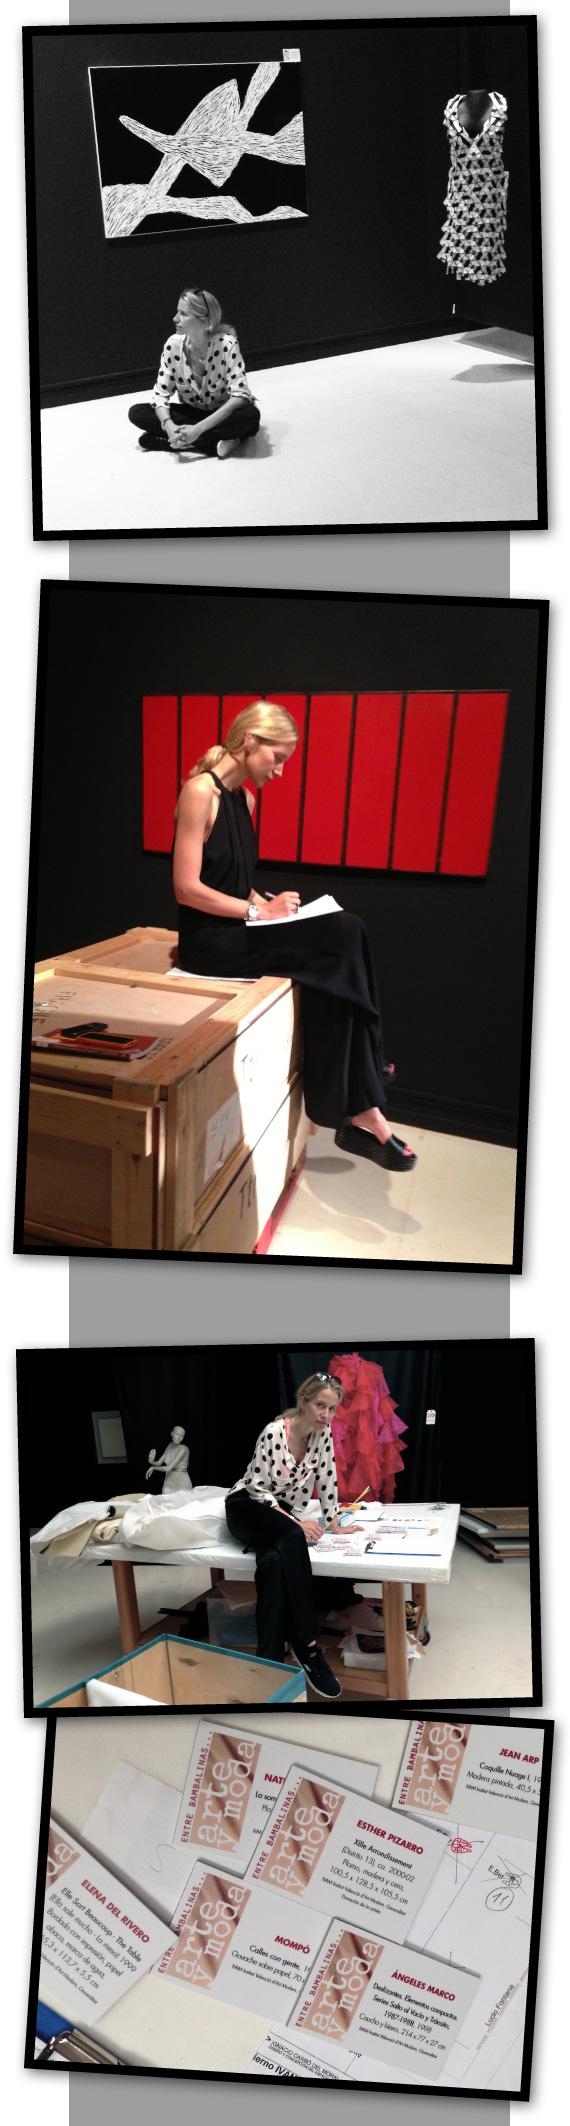 Maria Leon momentos de la exposición Instituto Valenciano de Arte Moderno